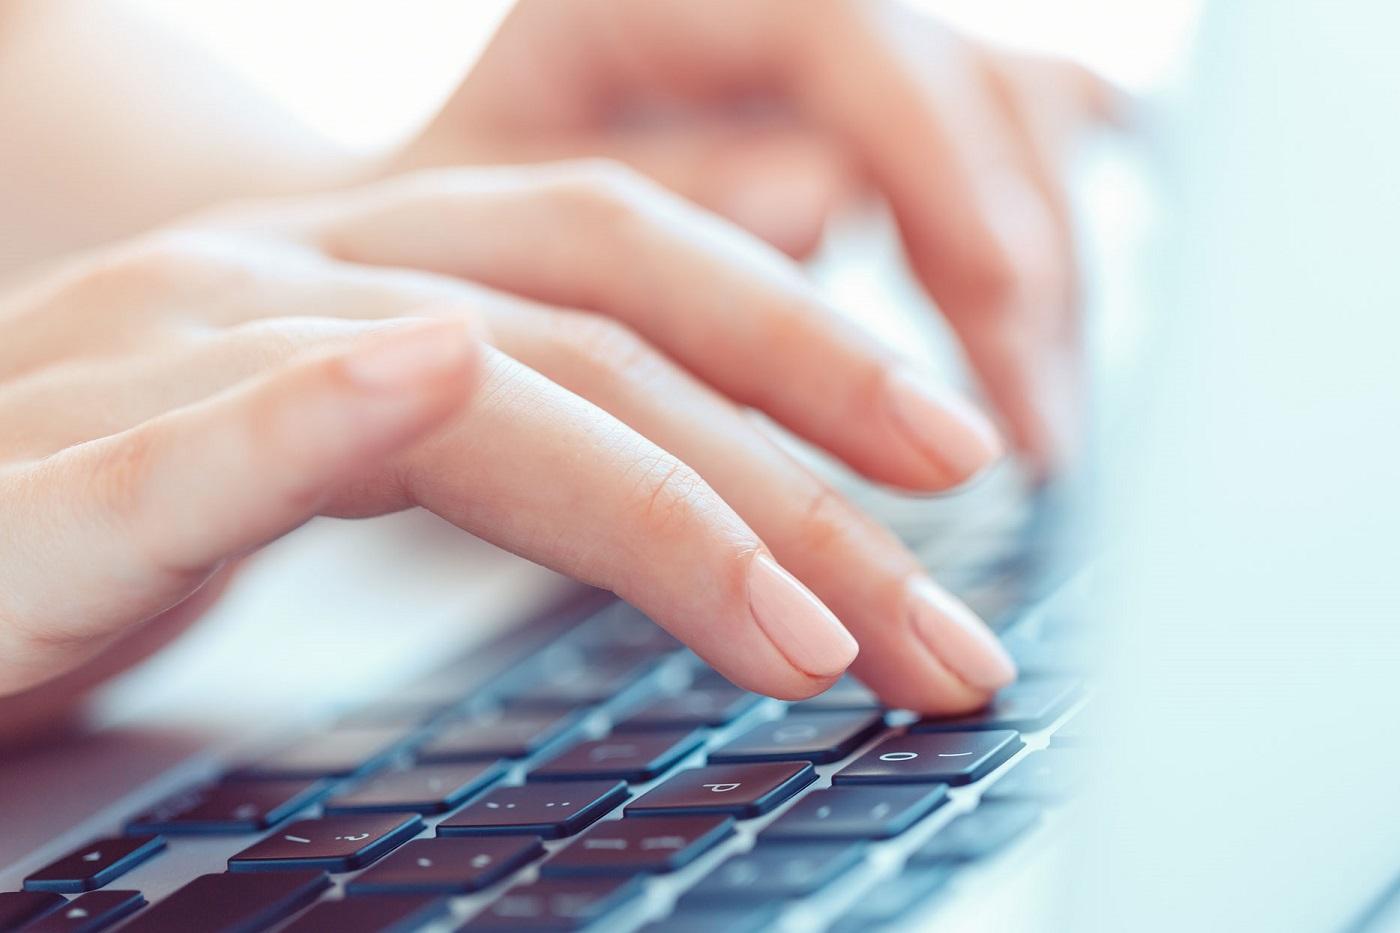 finance-translation-finance-language-solutions-female-hands-typing-laptop-keyboard_1400x933